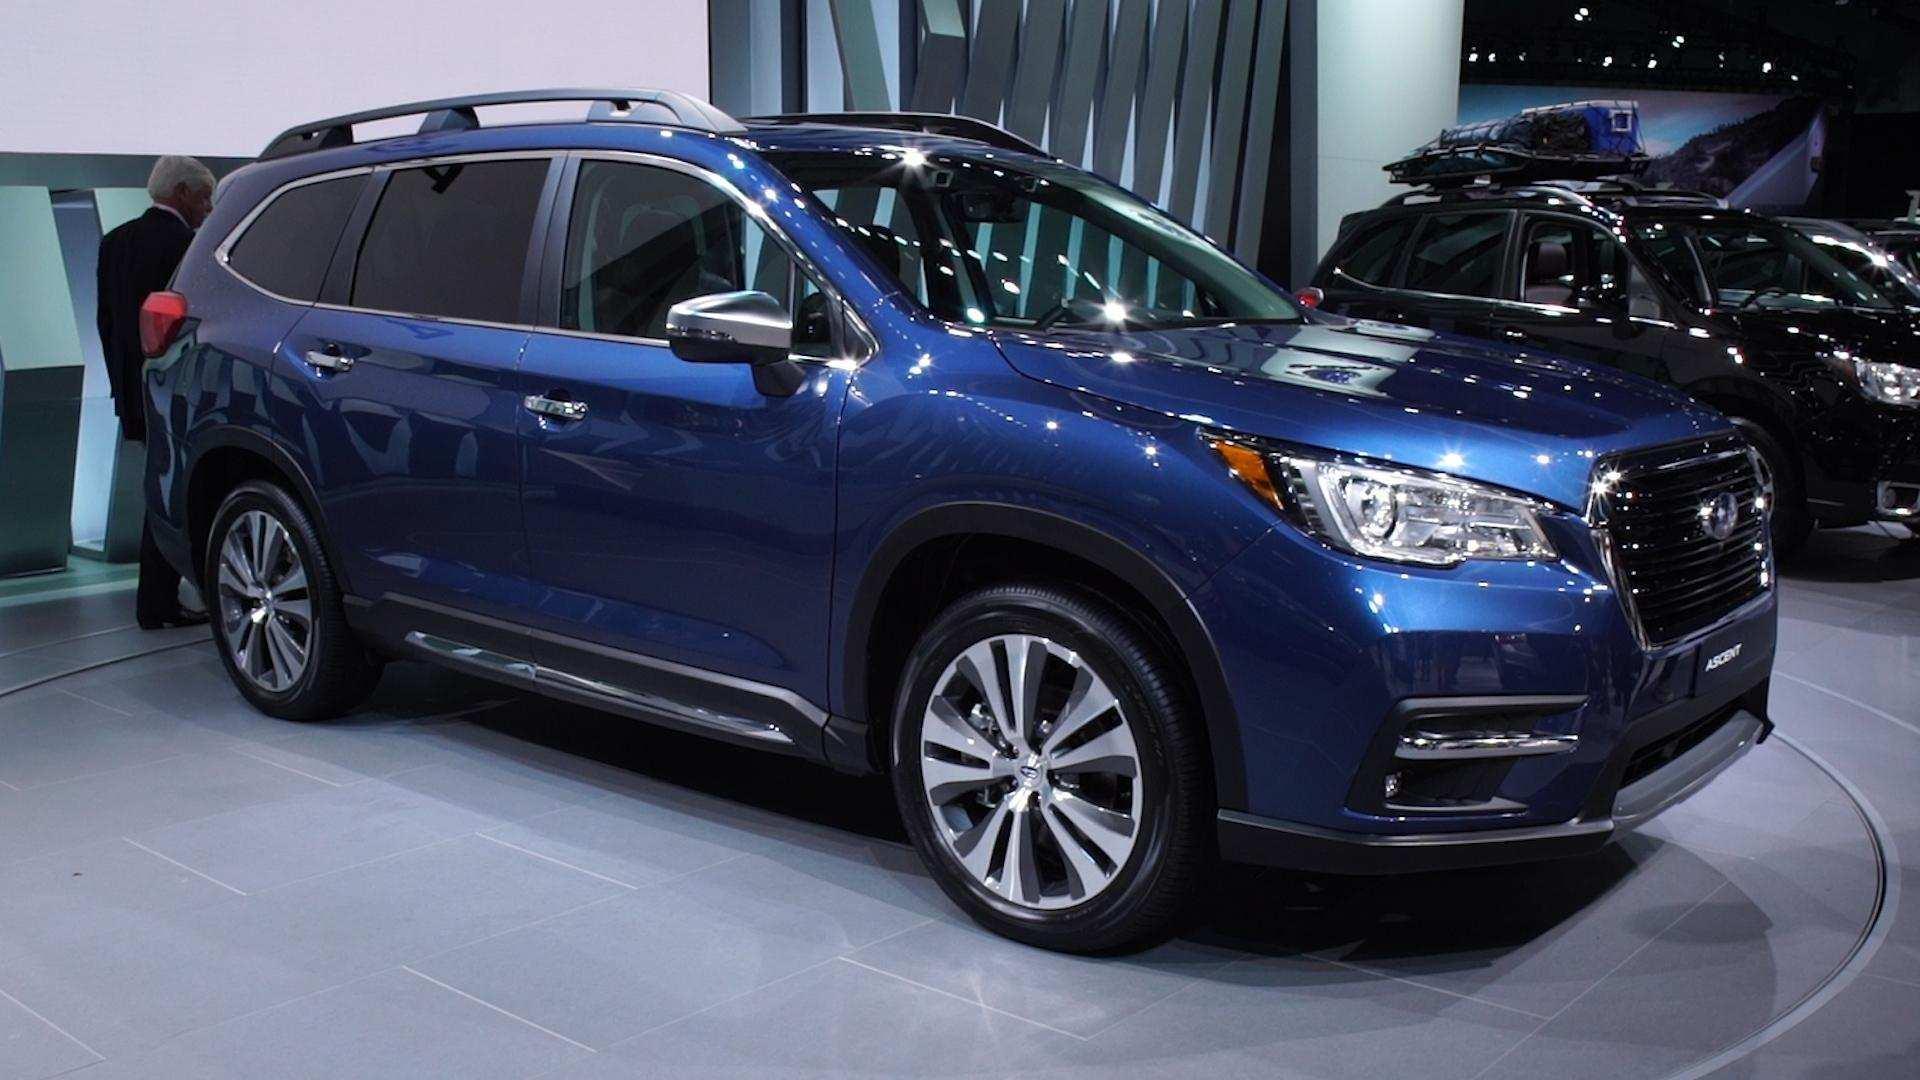 71 Gallery of 2019 Subaru Third Row New Concept for 2019 Subaru Third Row